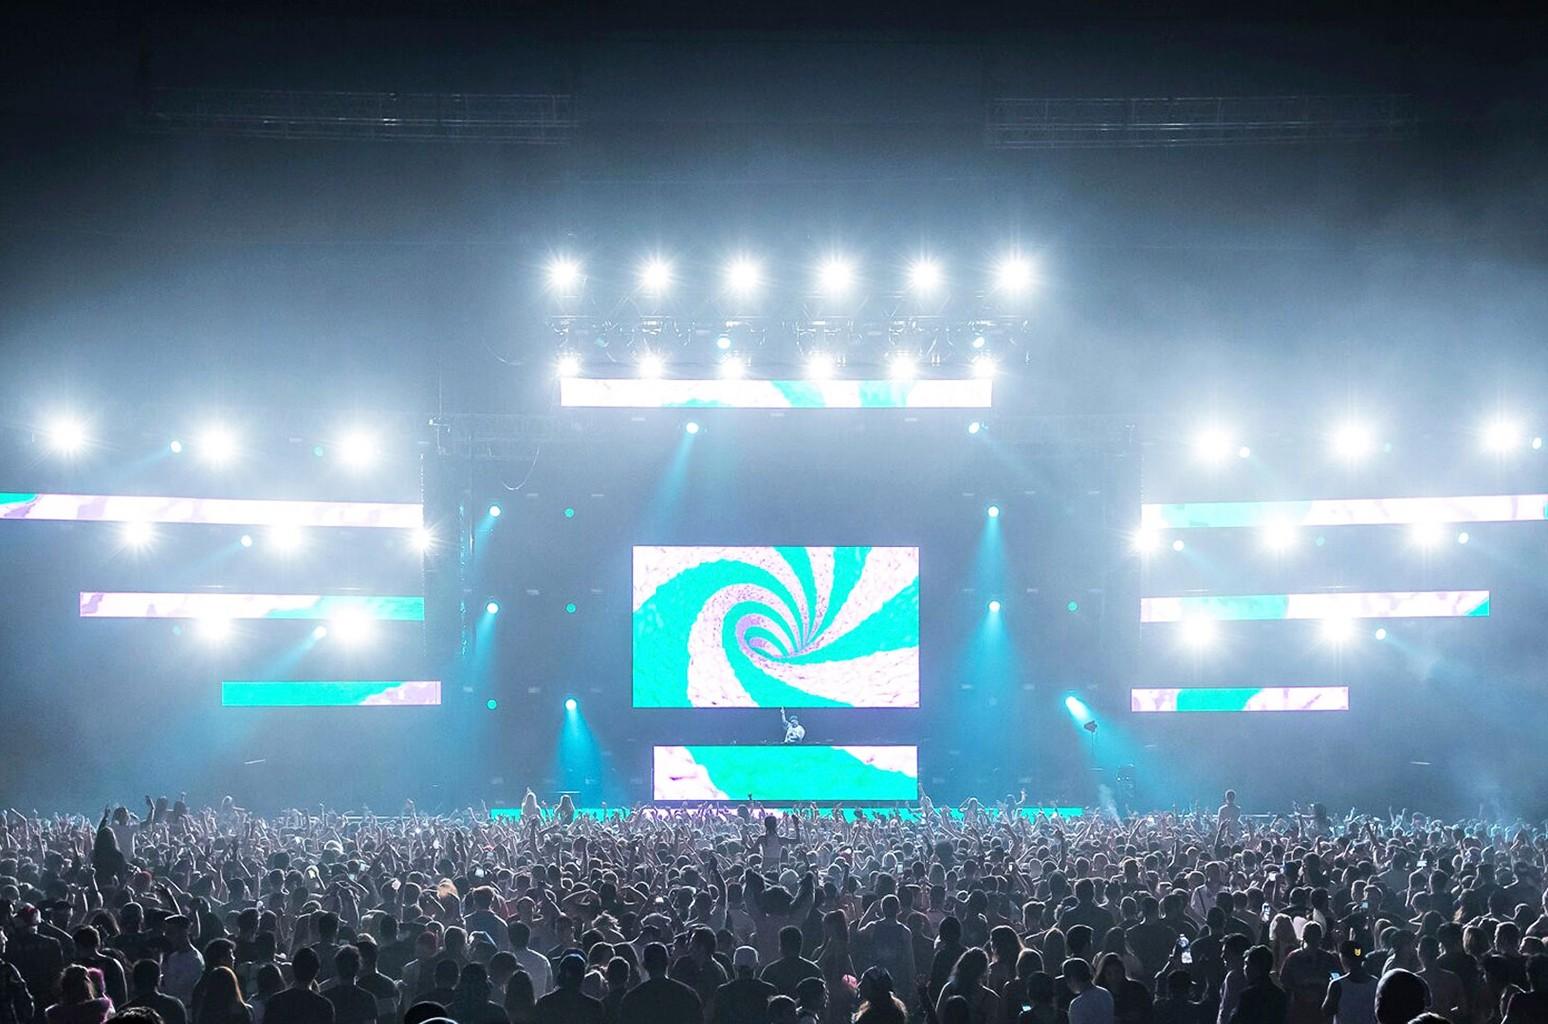 Contact Festival 2016